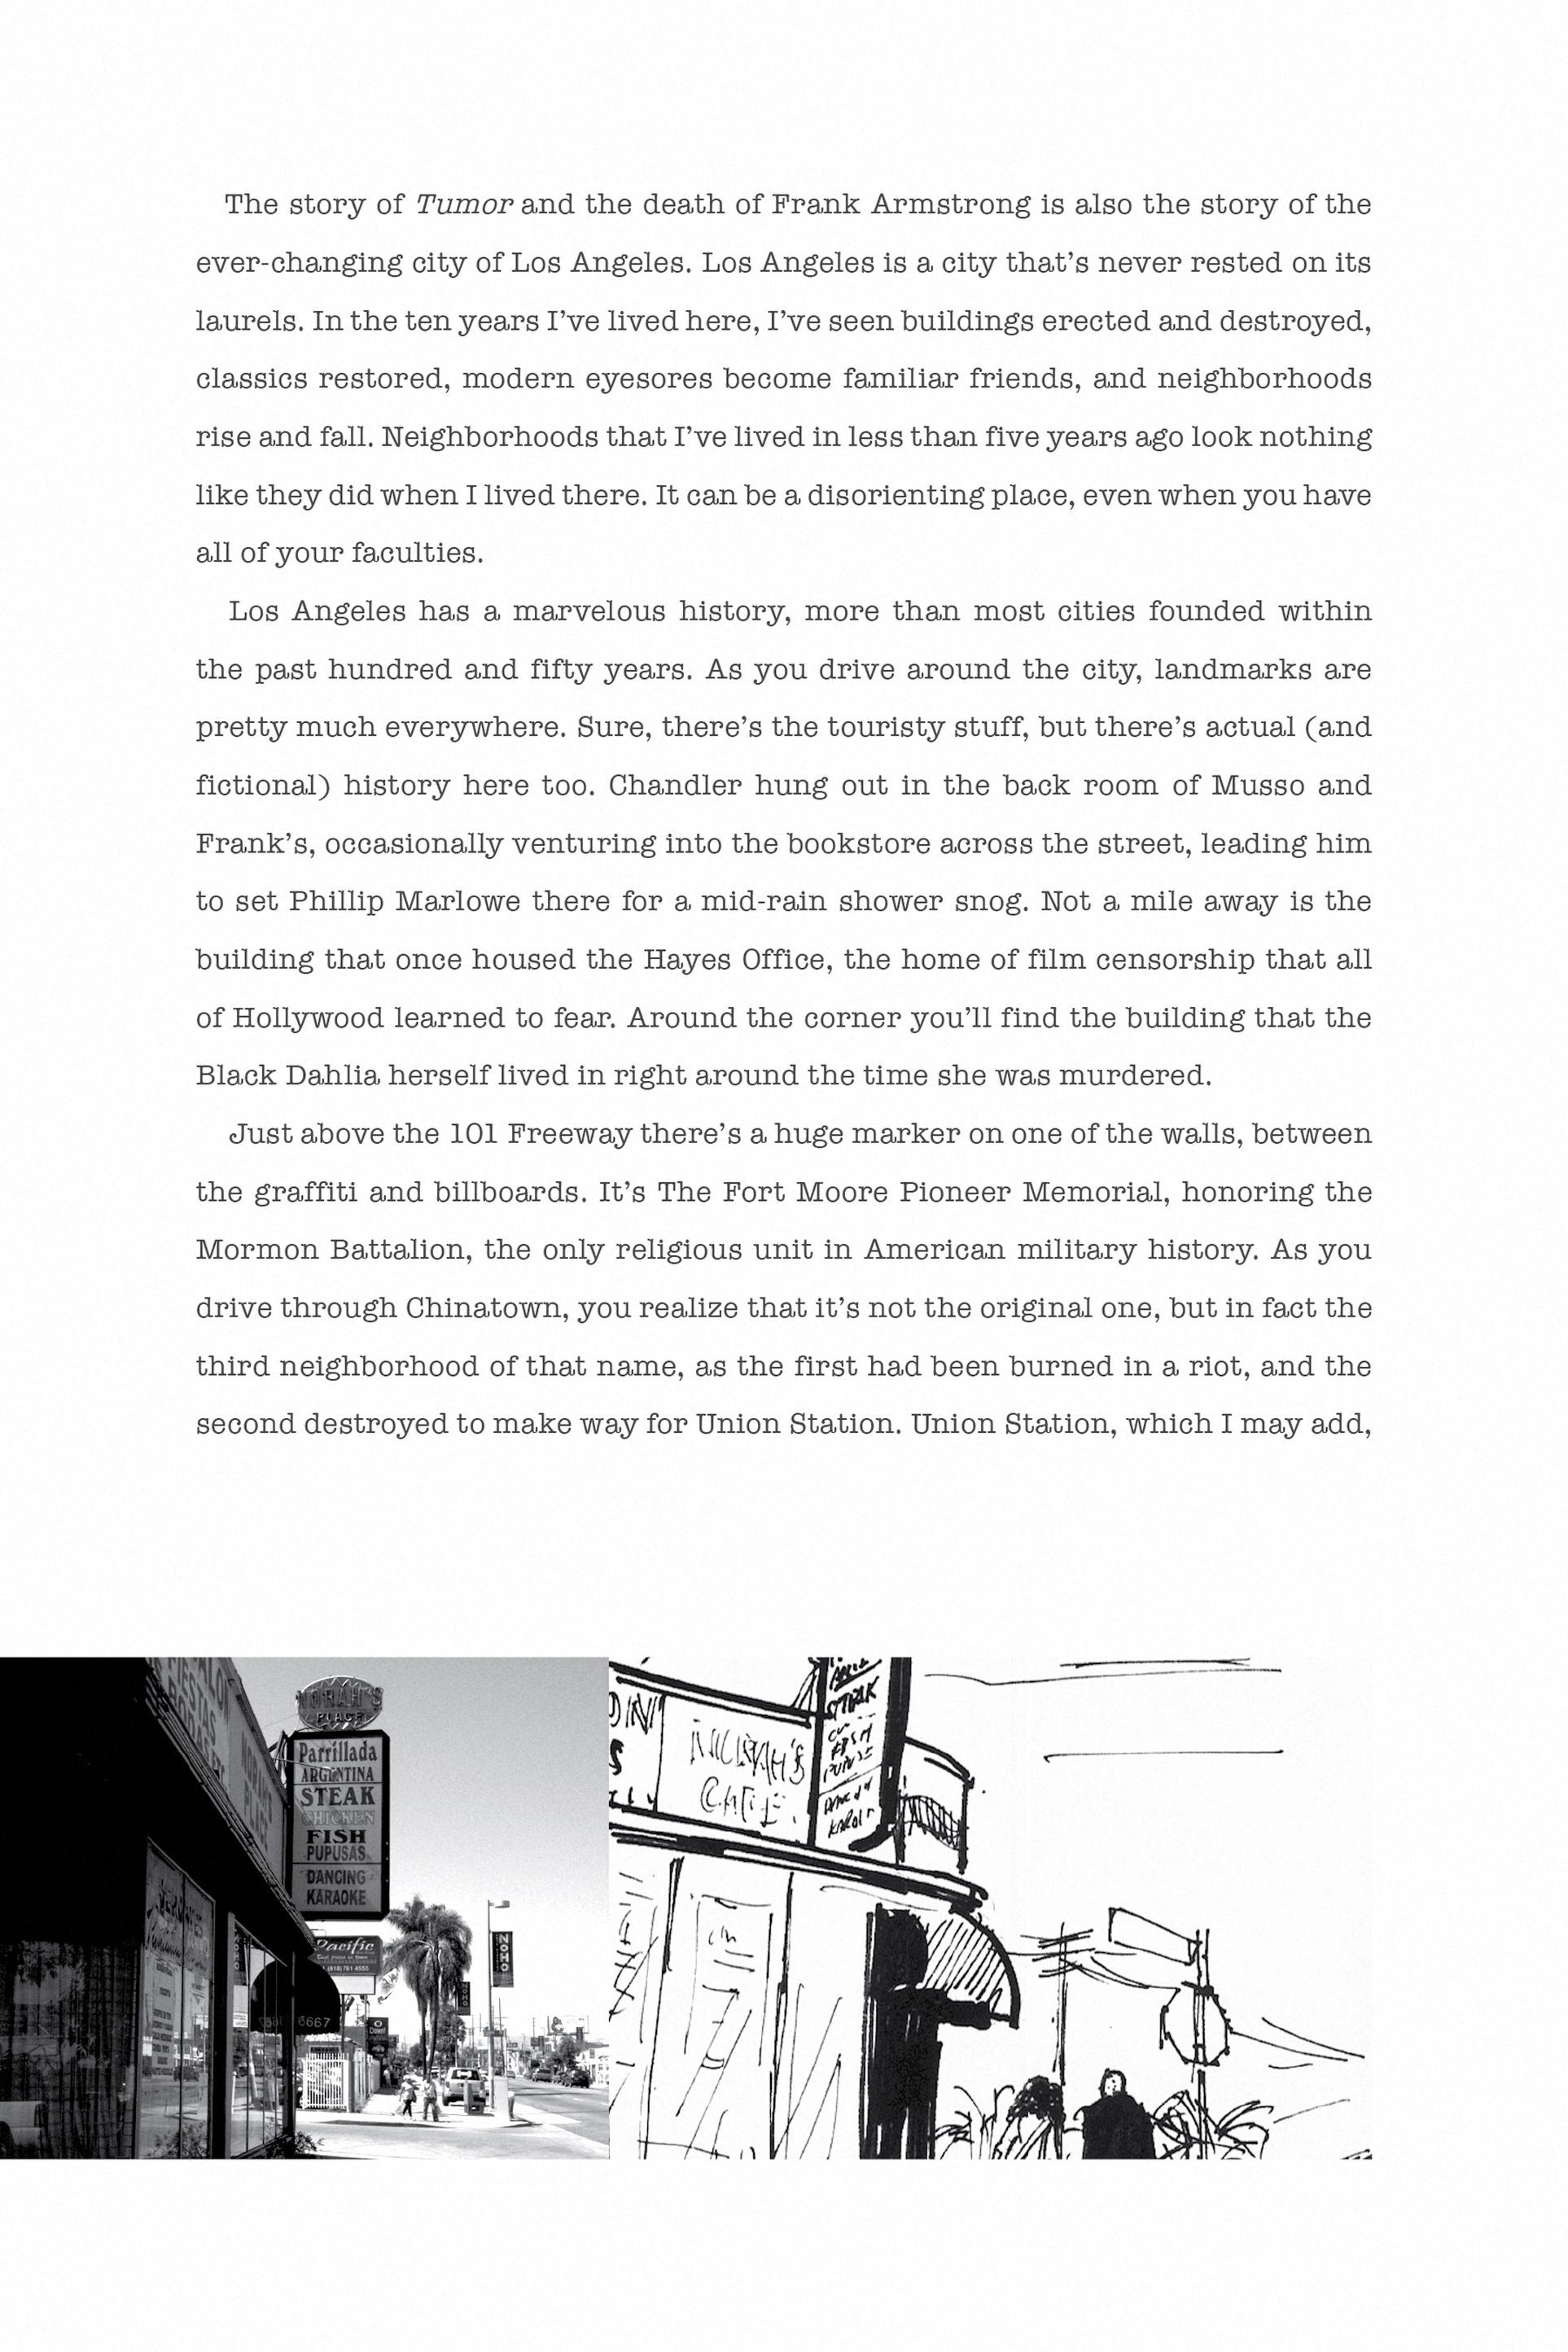 Read online Tumor comic -  Issue # TPB - 250